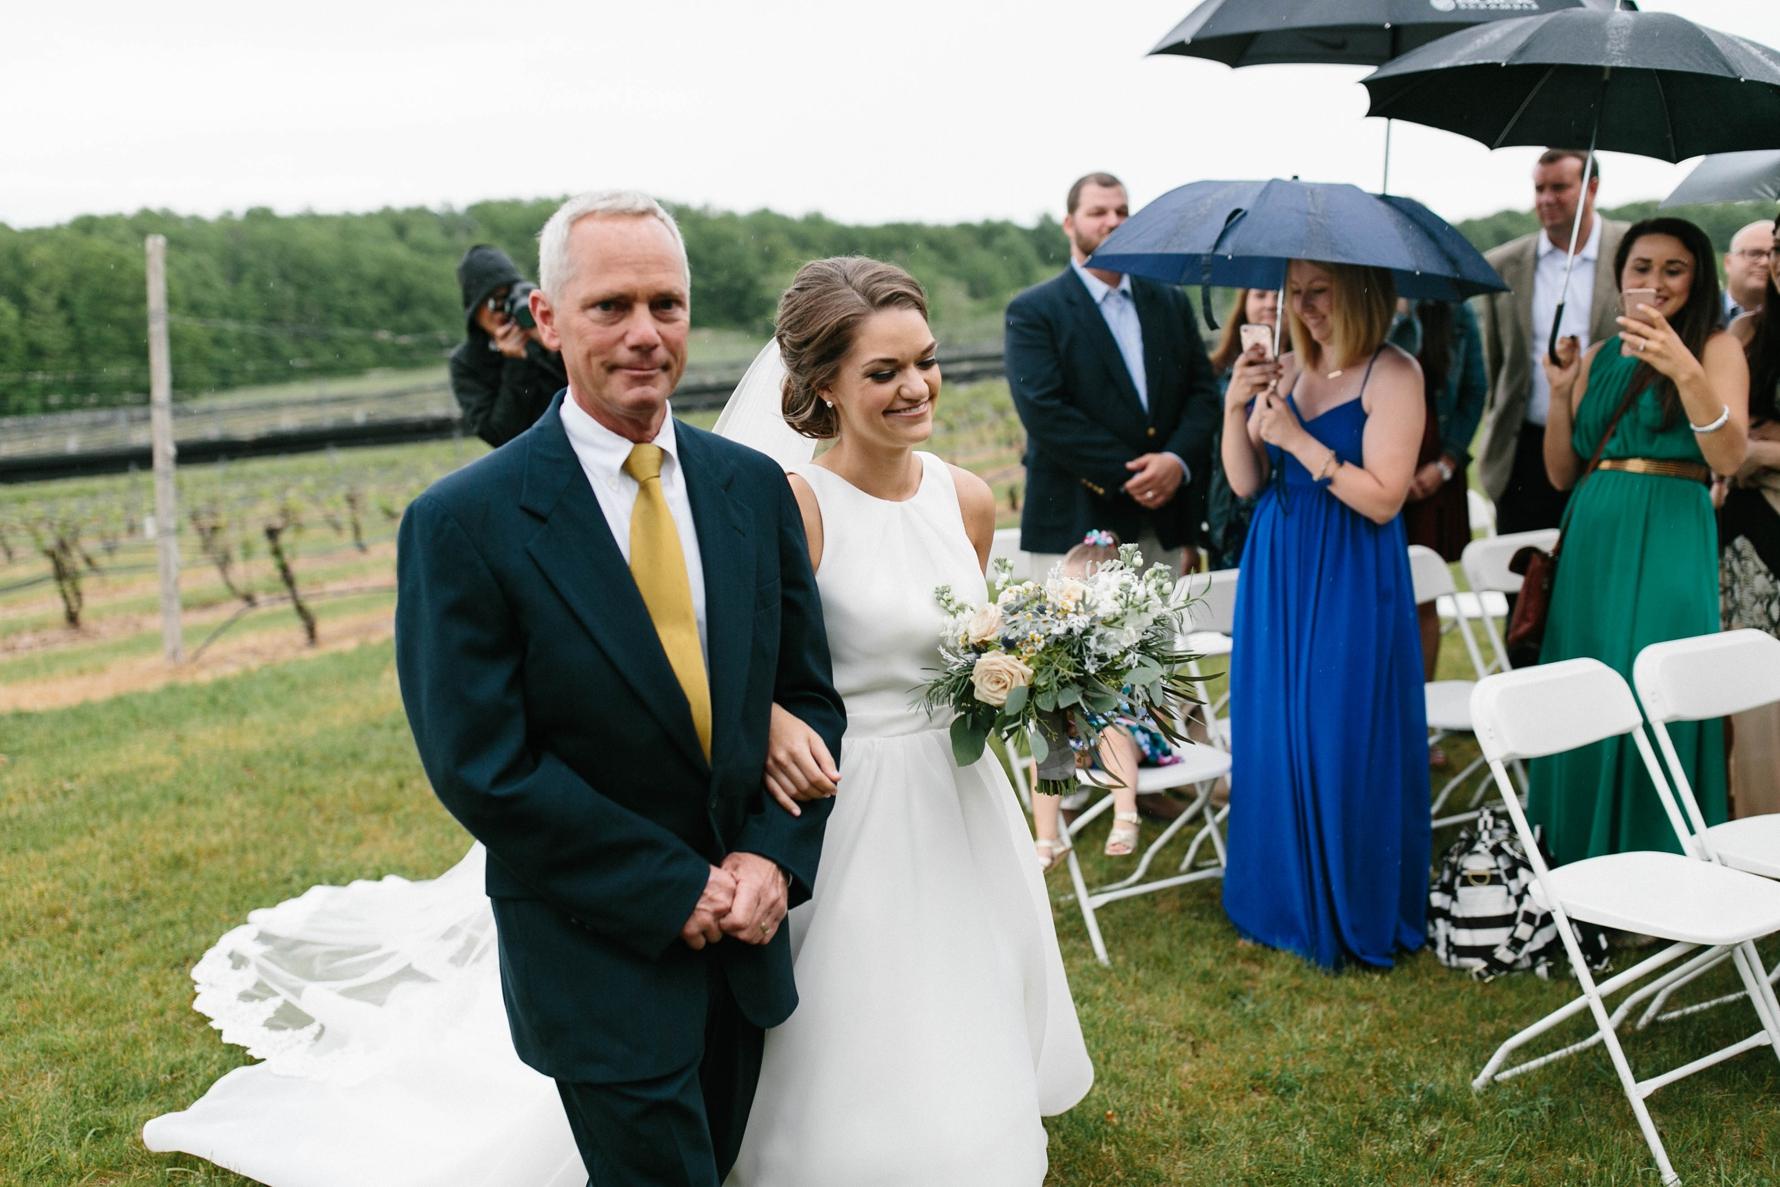 Anderson Wedding 043.JPG